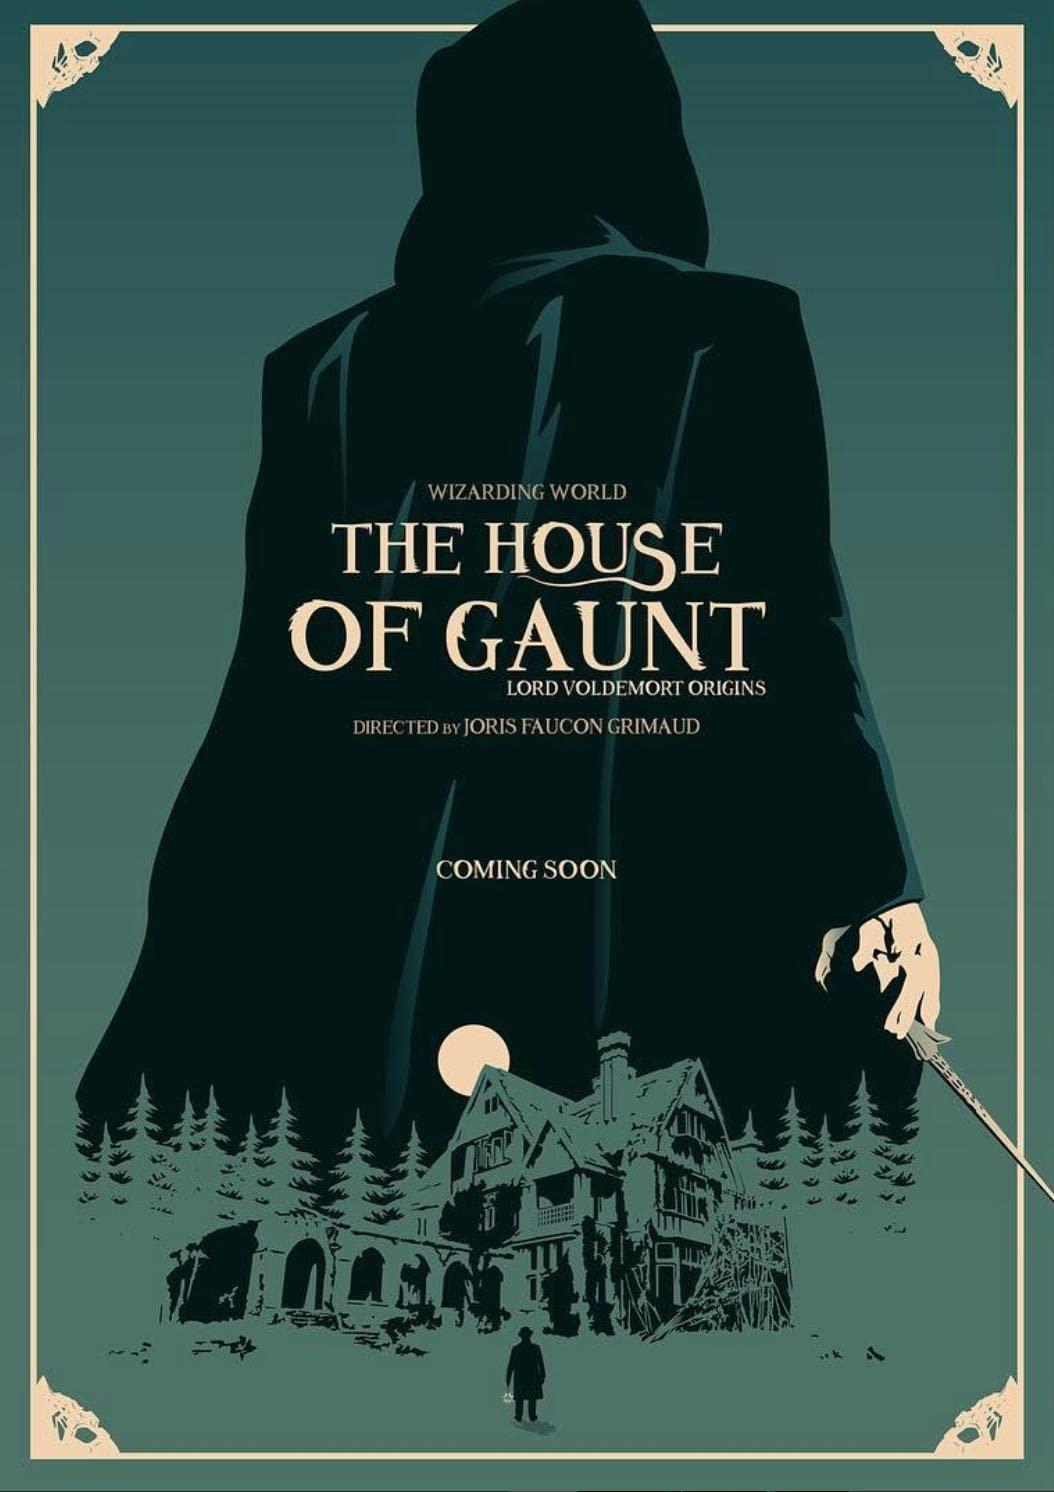 Gia Tộc Gaunt: Hồi Ký Của Chúa Tể Voldemort - The House Of Gaunt: Lord Voldemort Origins